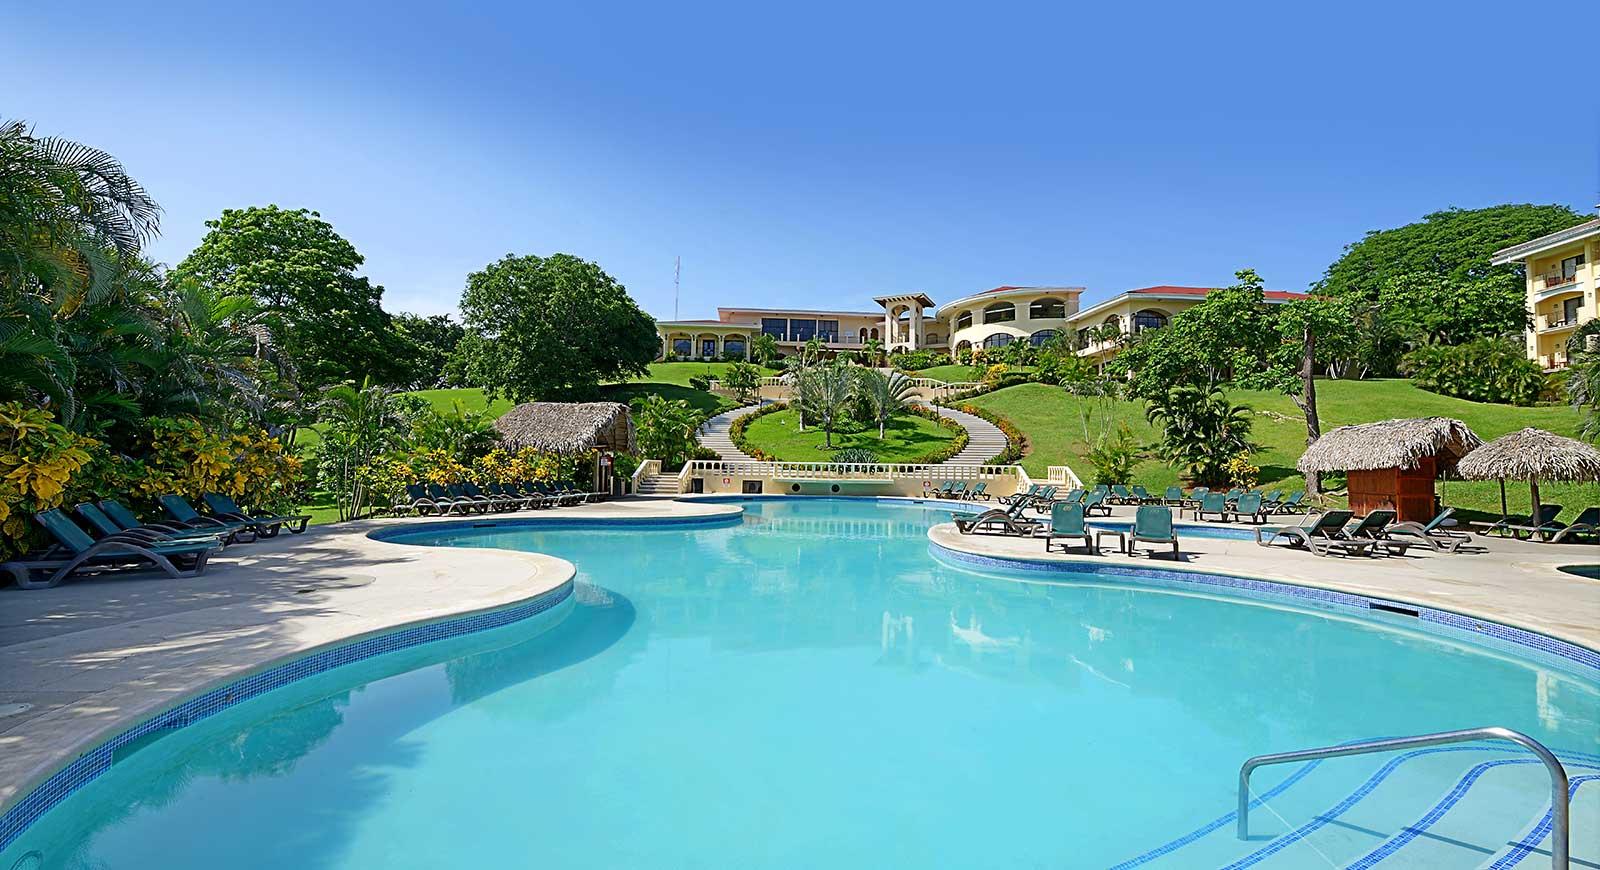 373-swimming-pool-2-hotel-occidental-grand-papagayo-resort_tcm21-44127